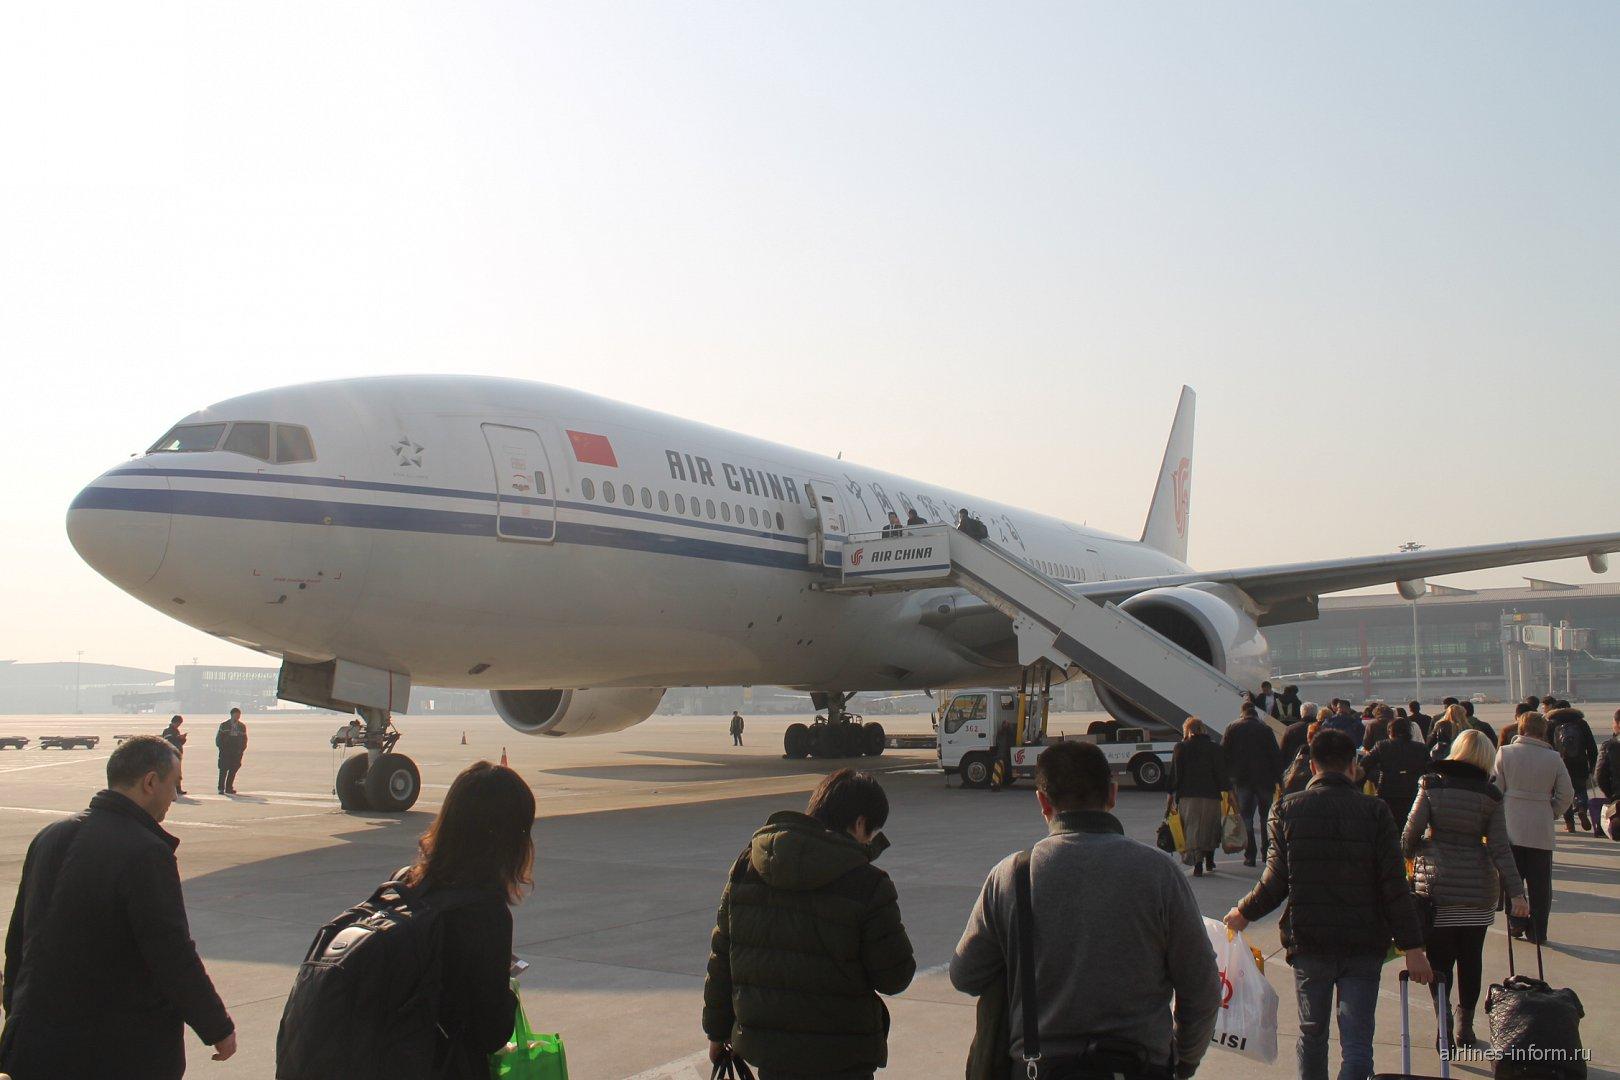 Air China- Бангког- Пекин- Москва,,, Pt 2